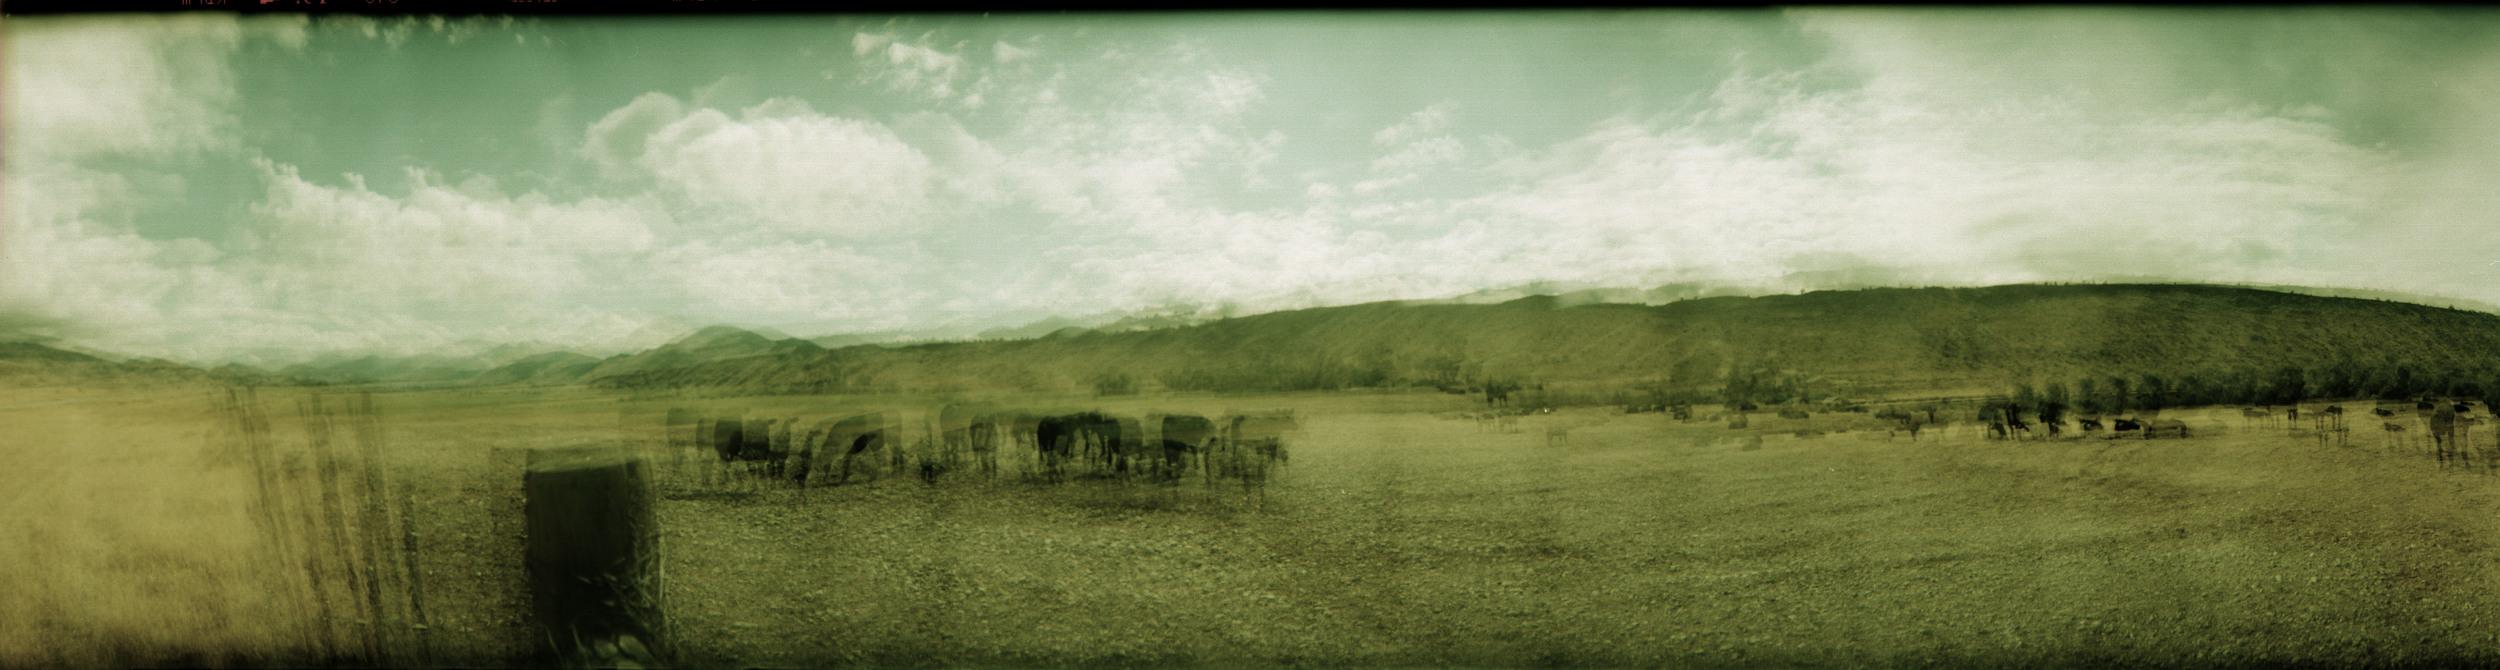 cows pana 2.jpg